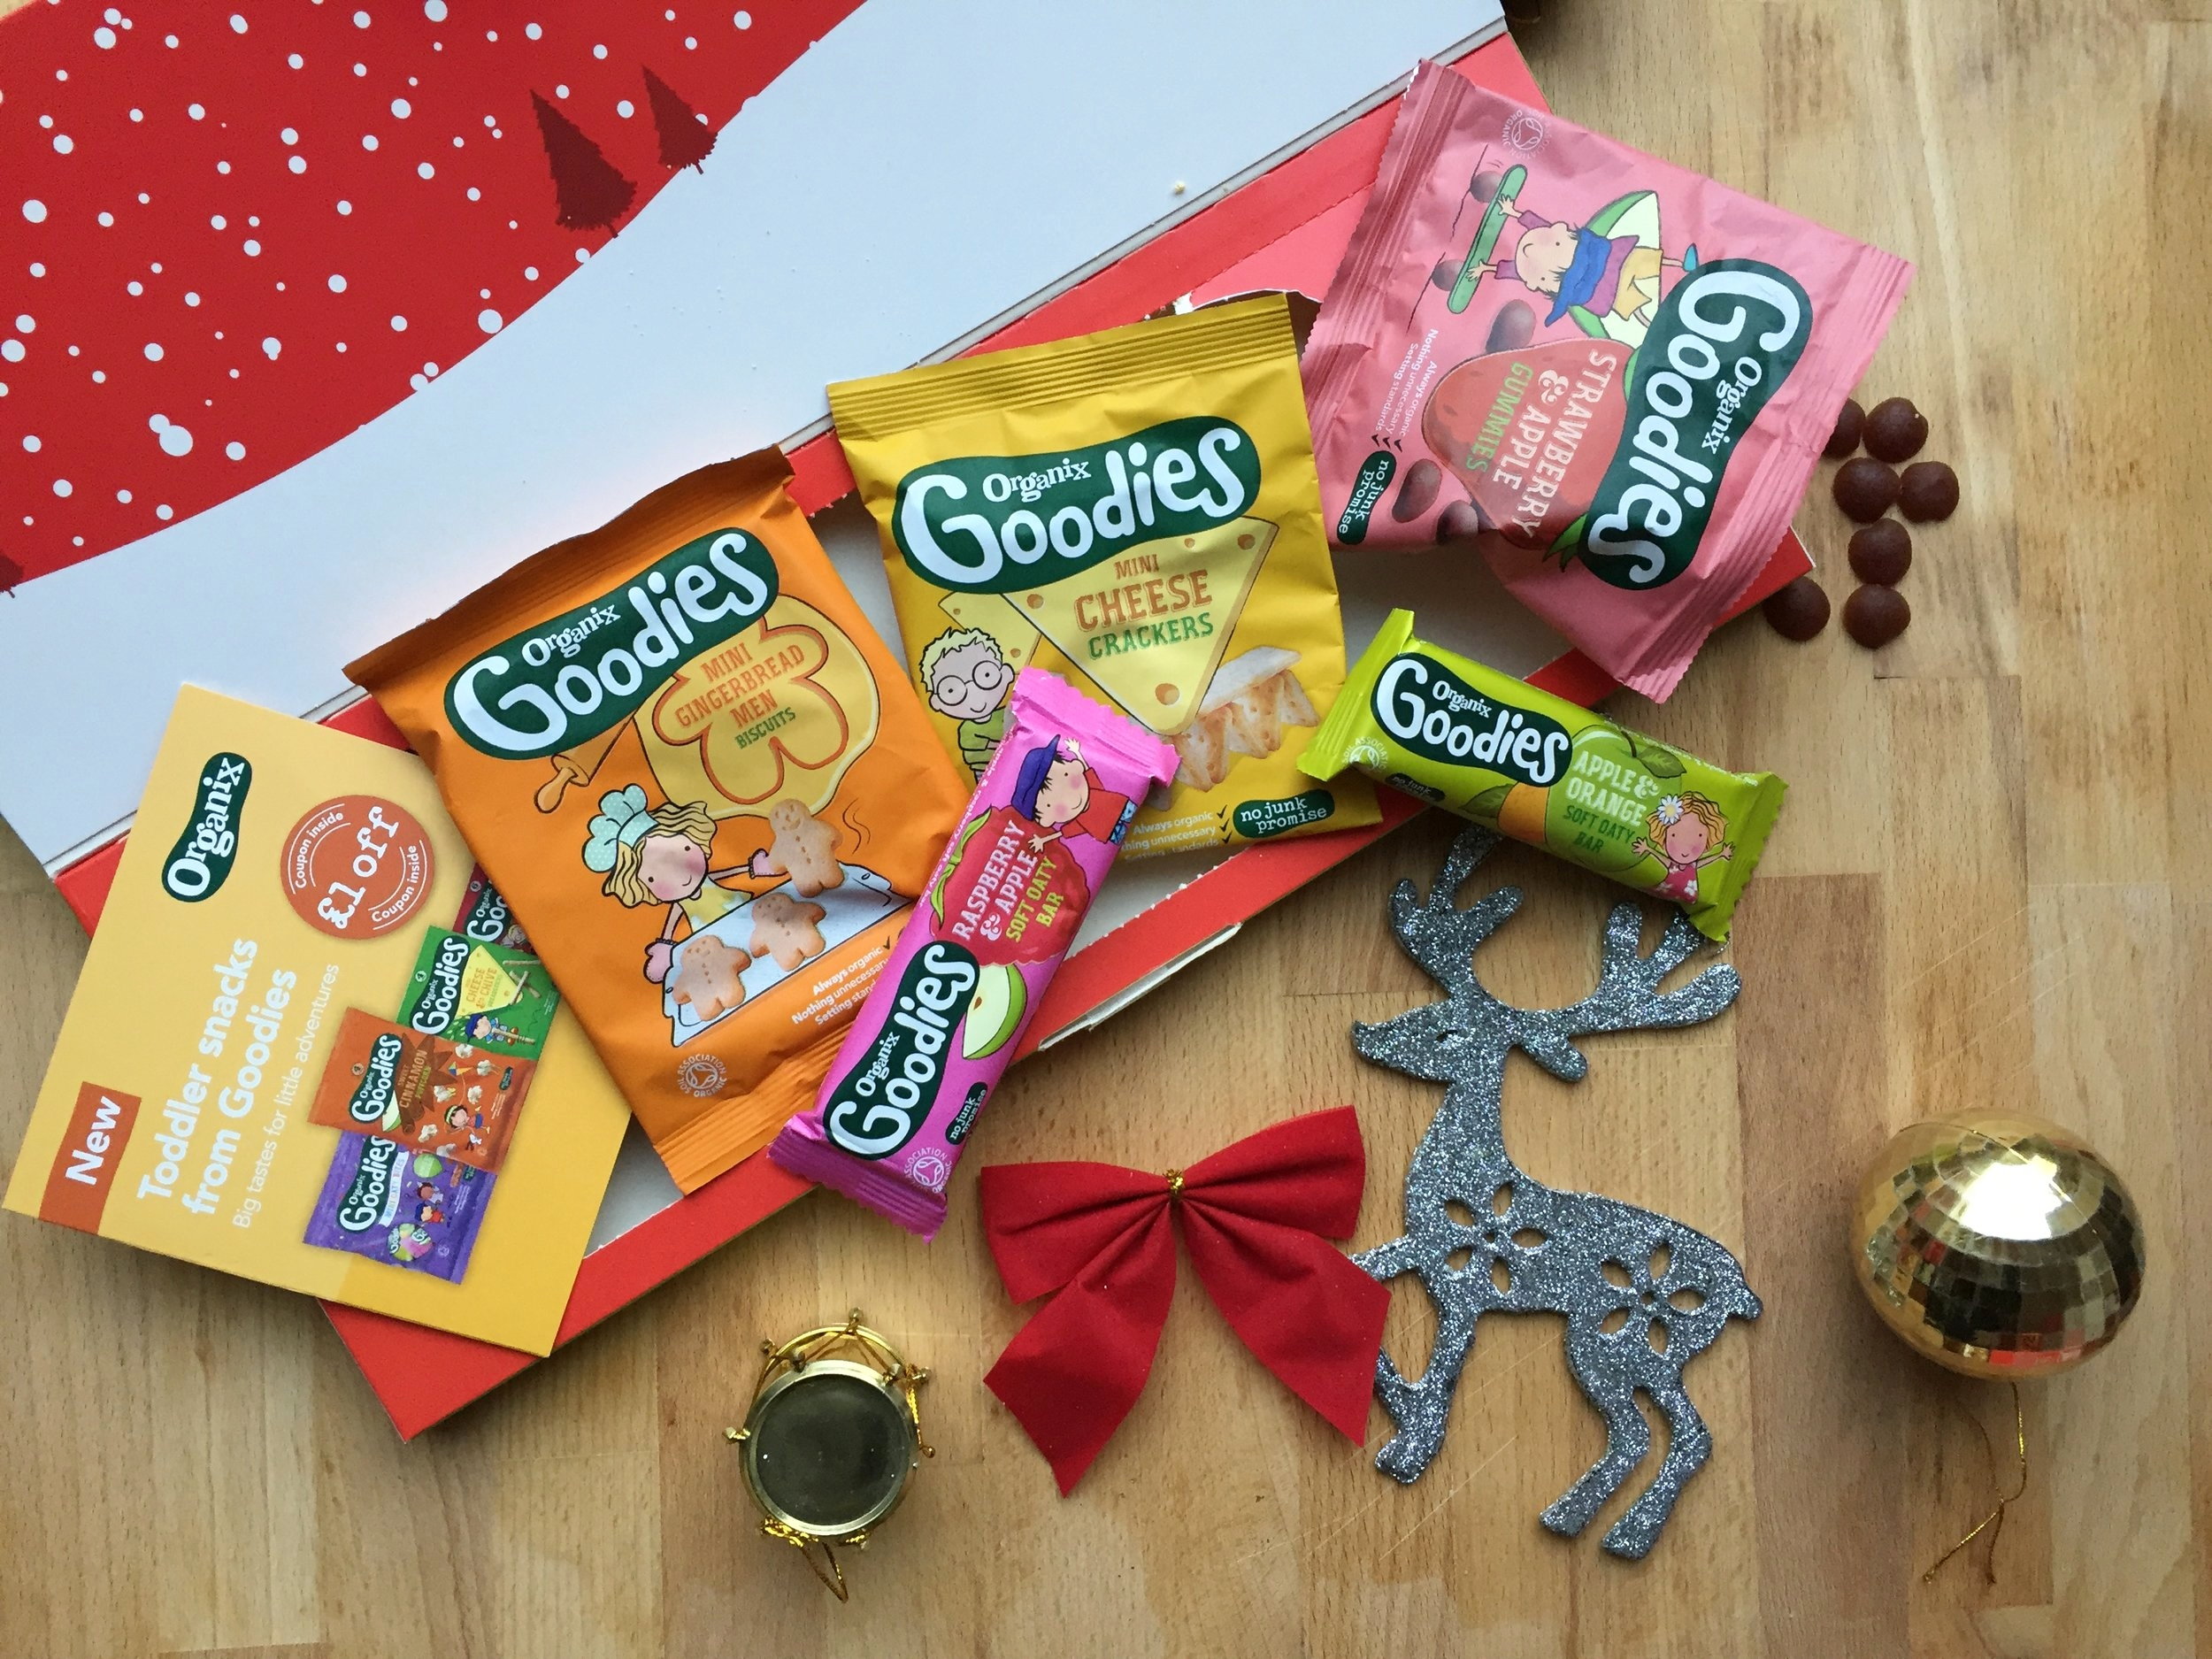 Organix Christmas Selection Box Contents